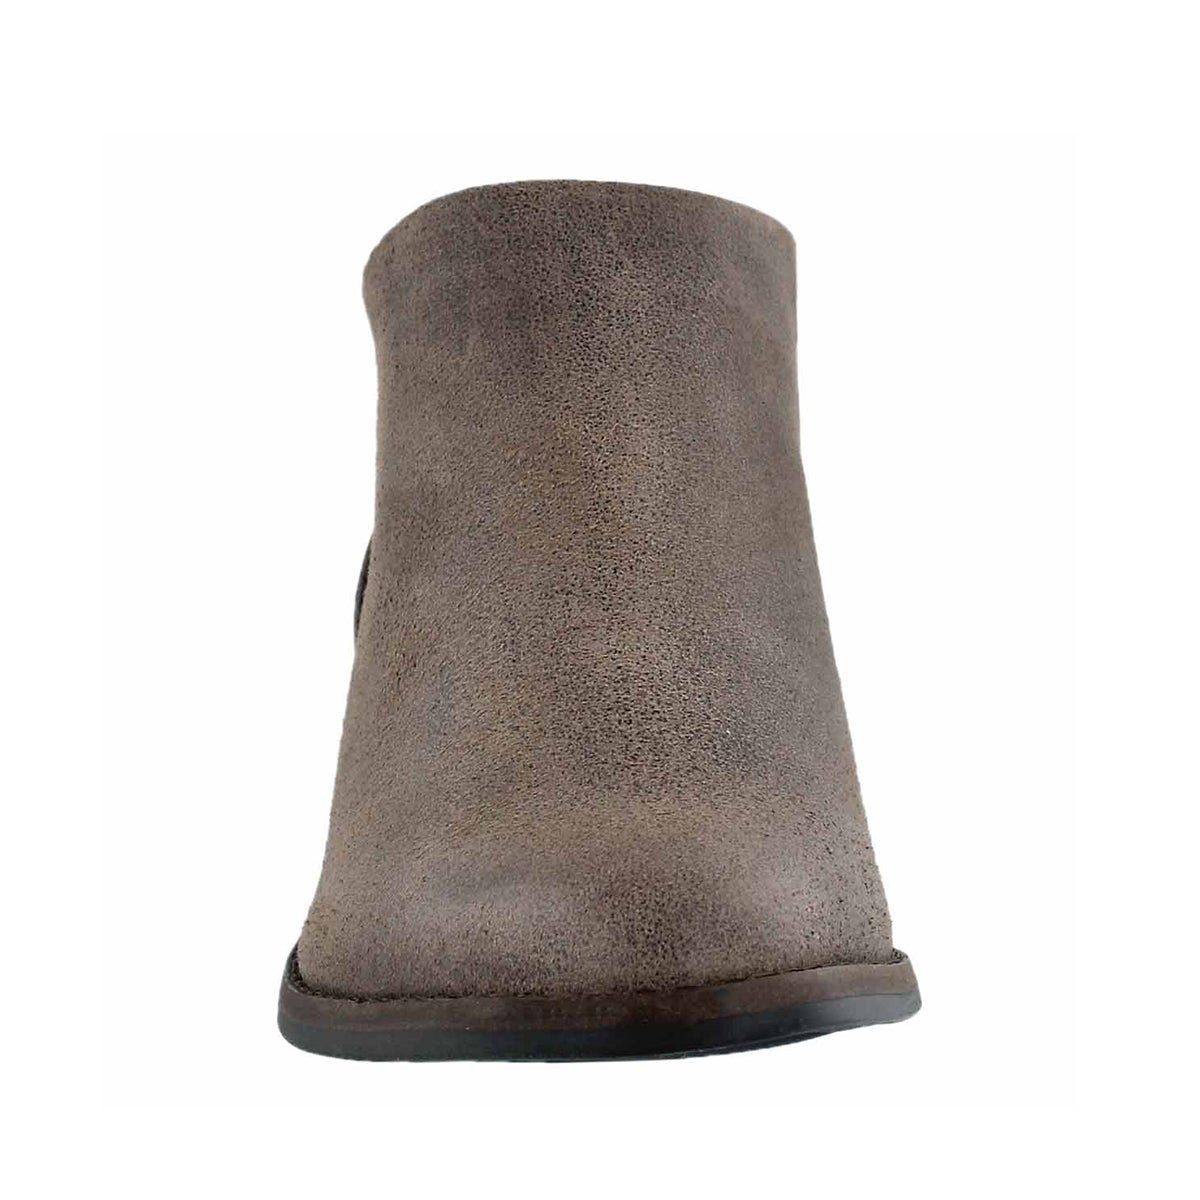 Lds Fai brindle zip up low casual bootie